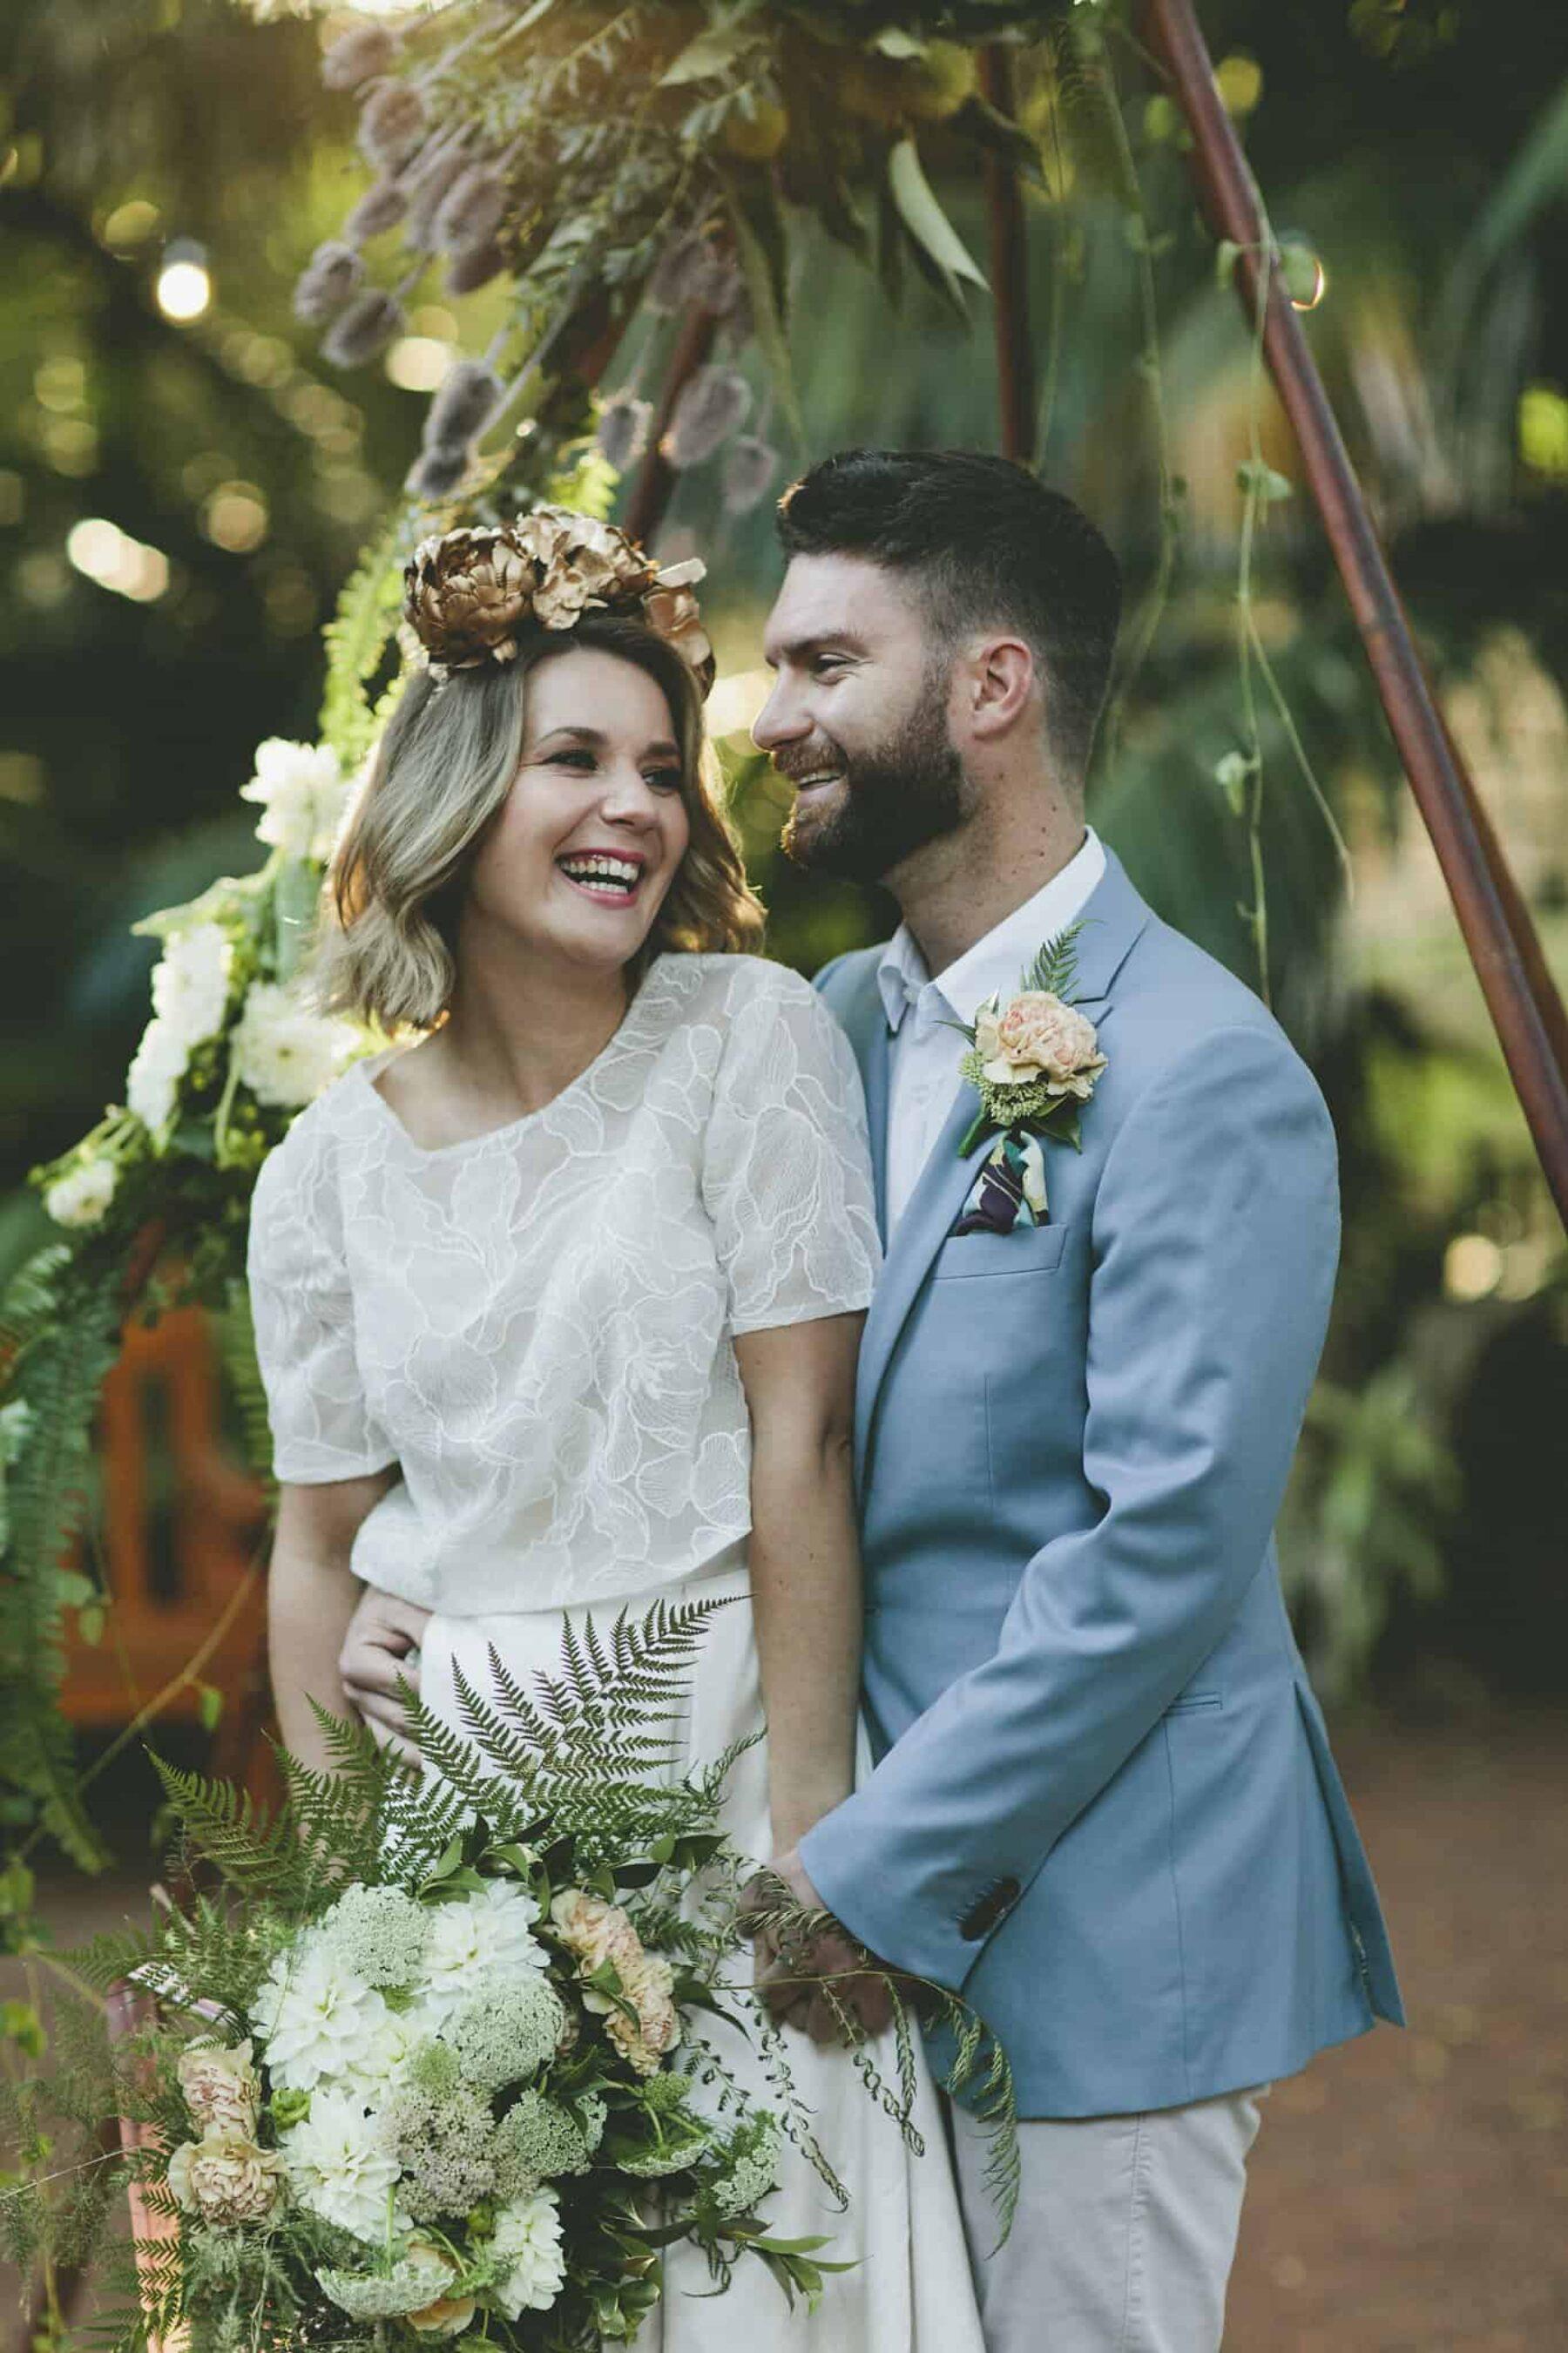 Perth Wedding Upmarket 2018 fair